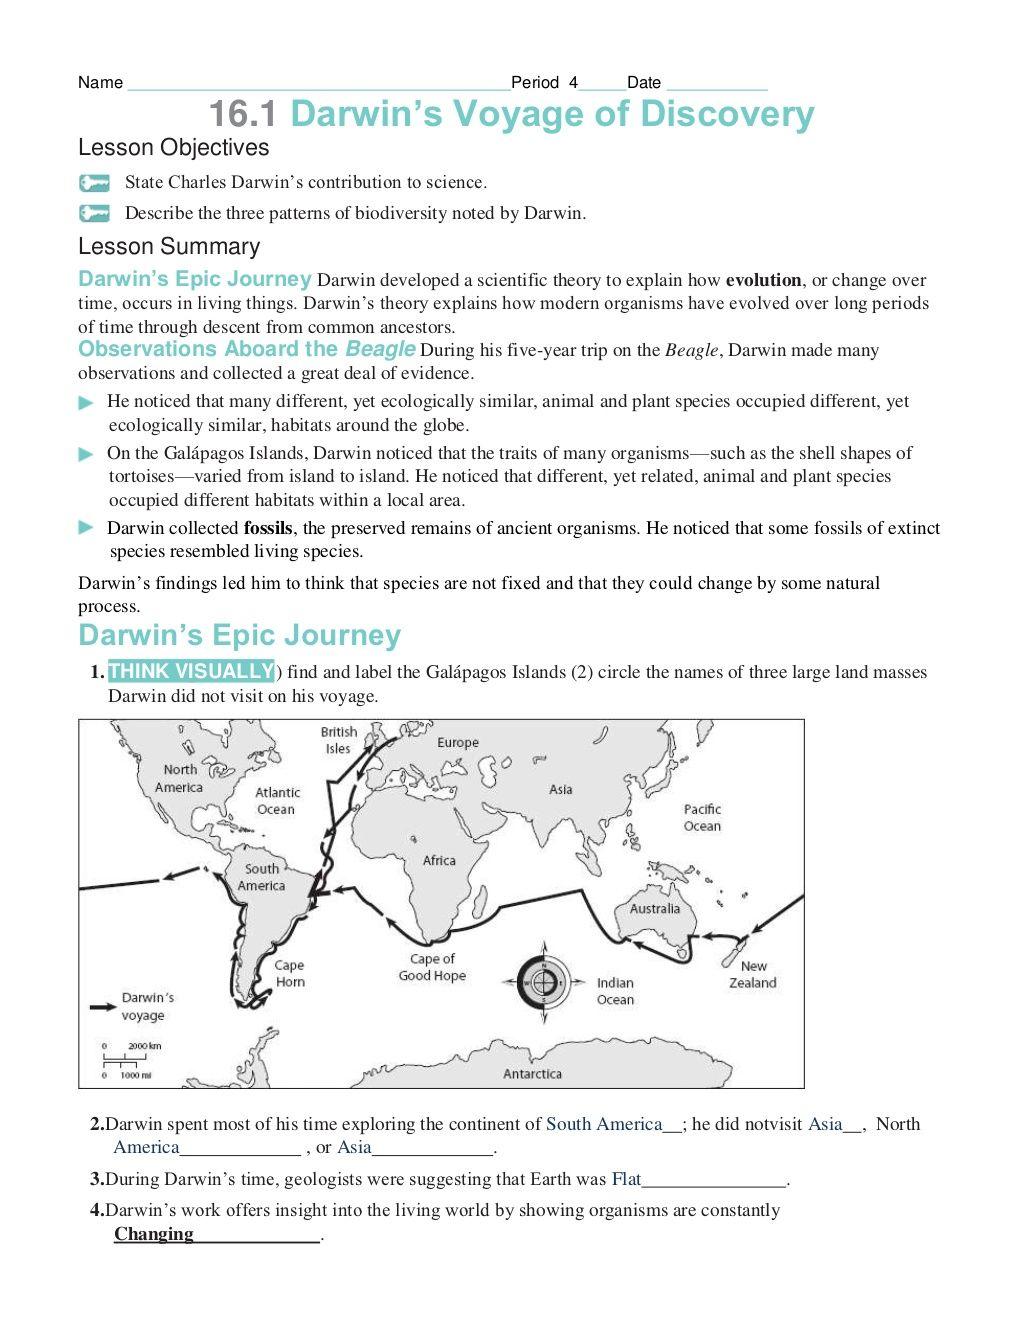 Chapter 16 Worksheets By Jfg082 Via Slideshare